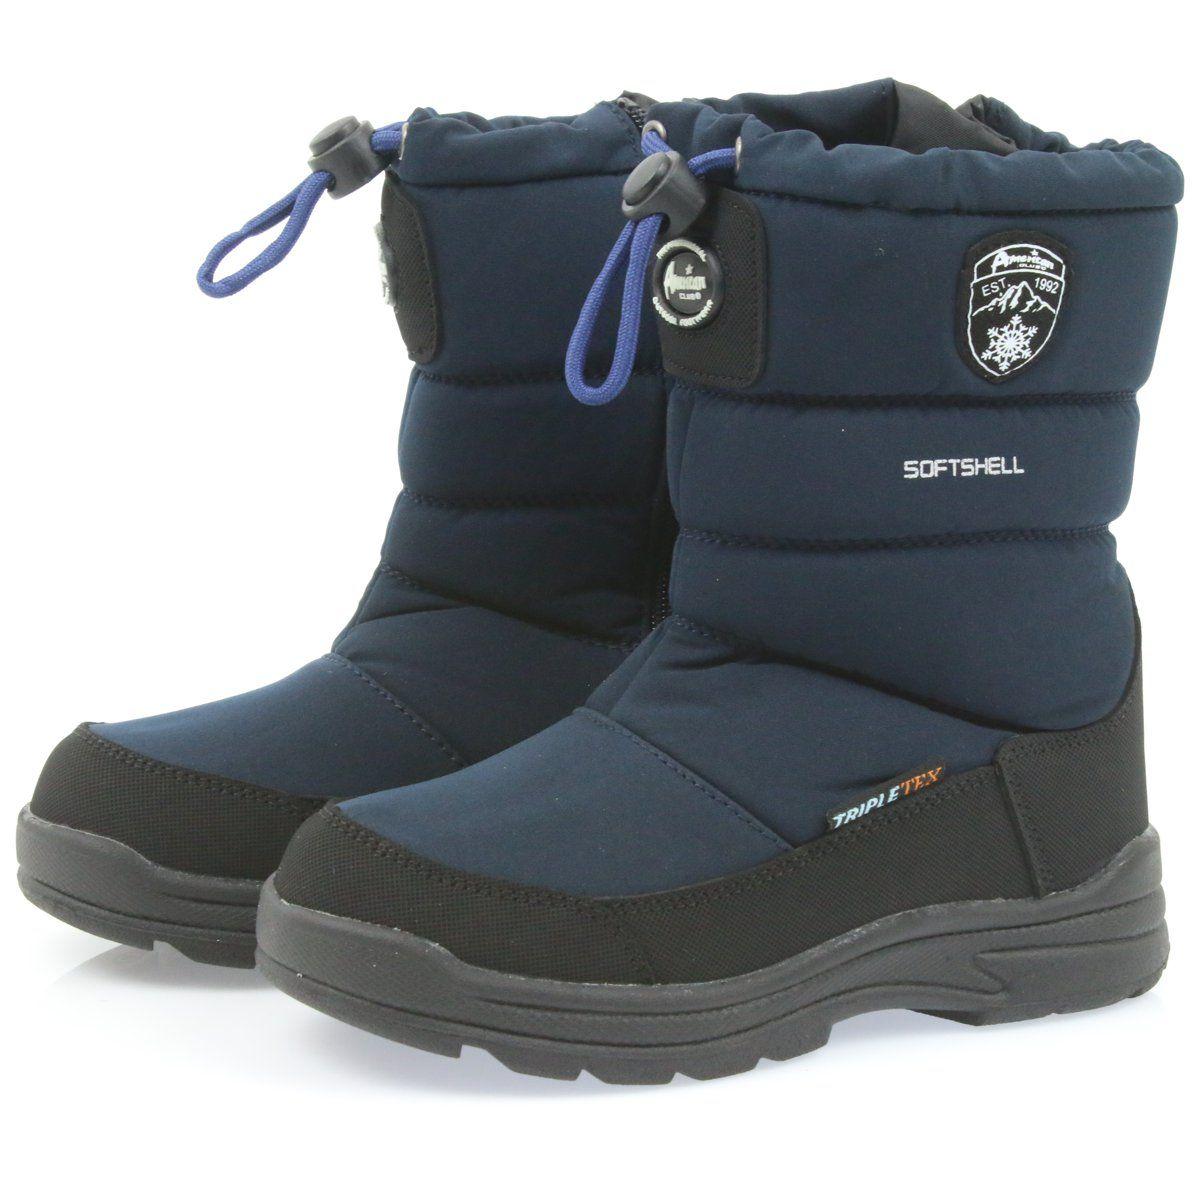 American Club Buty Z Membrana American 801sb Granatowe Czarne Boots Winter Boot Shoes